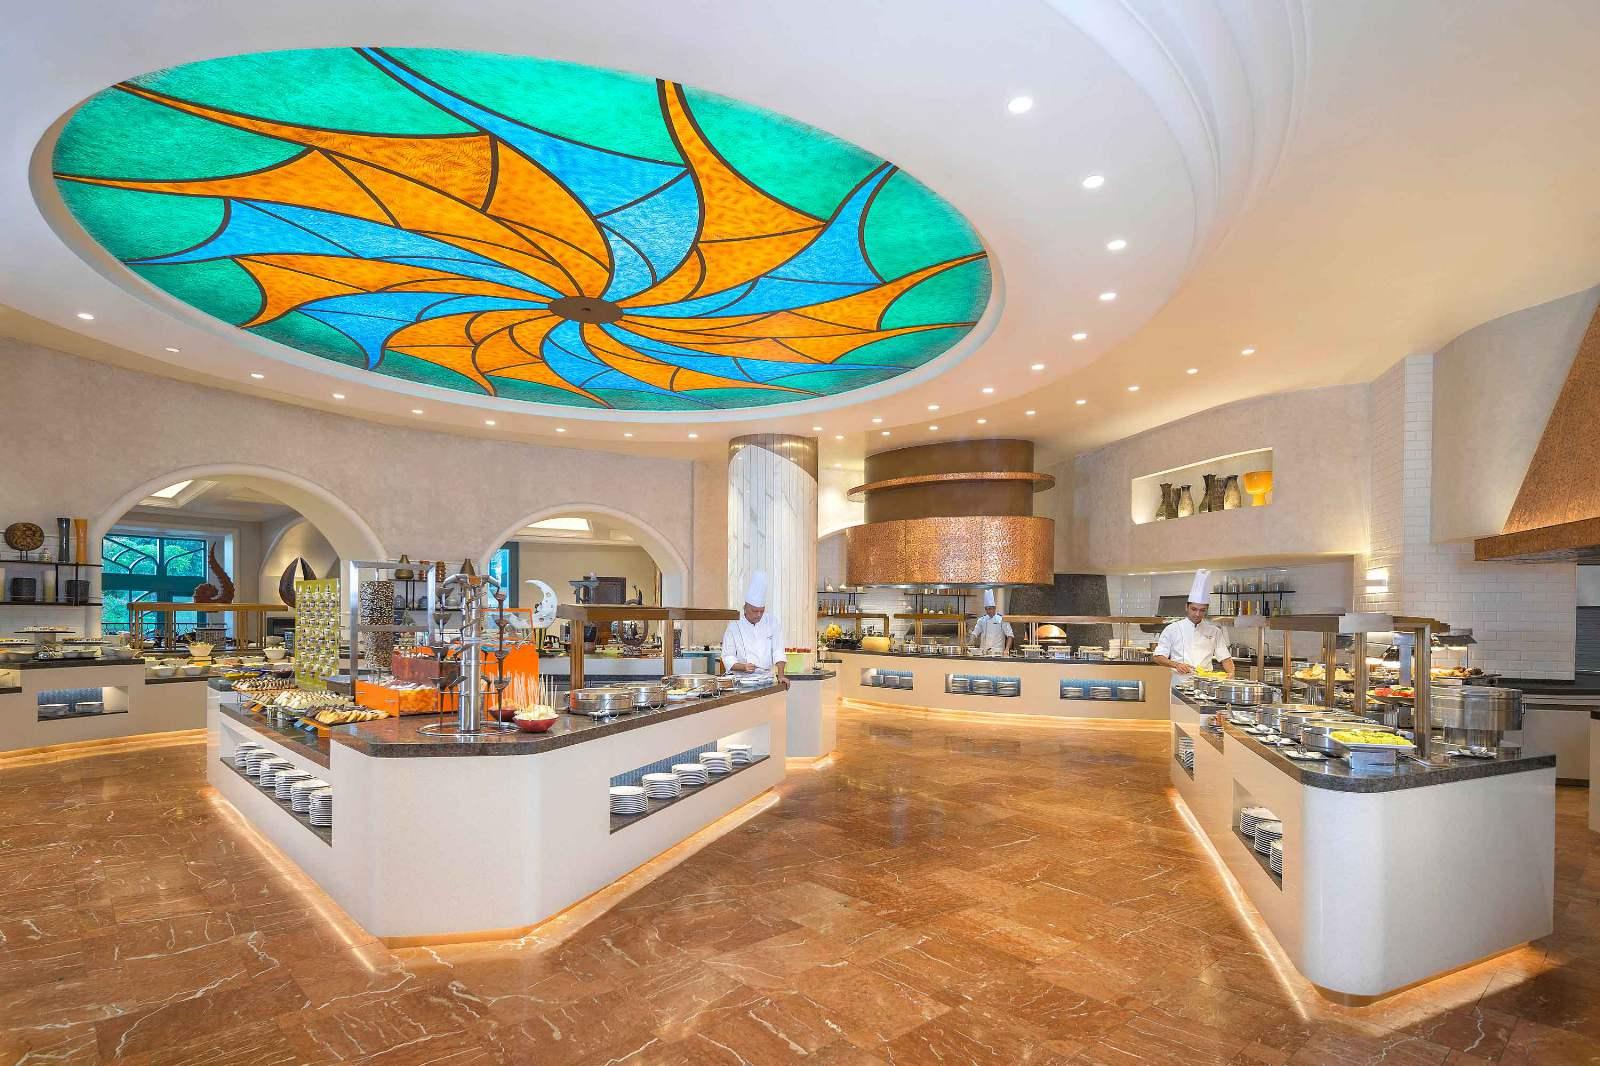 Atlantis, The Palm - Kaleidoscope Restaurant